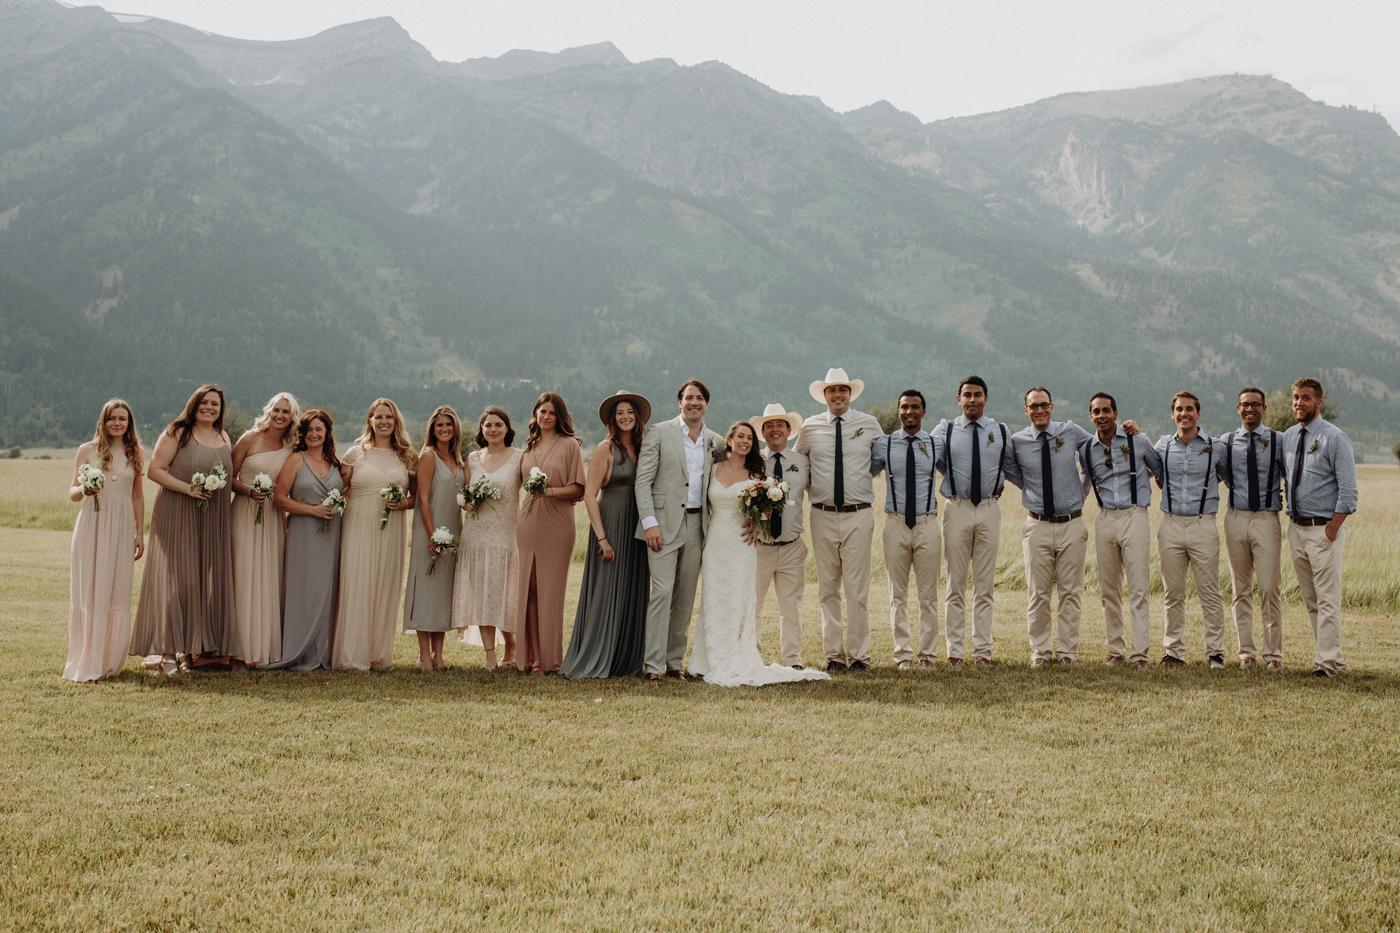 040-grand-teton-jackson-hole-wyoming-wedding.jpg